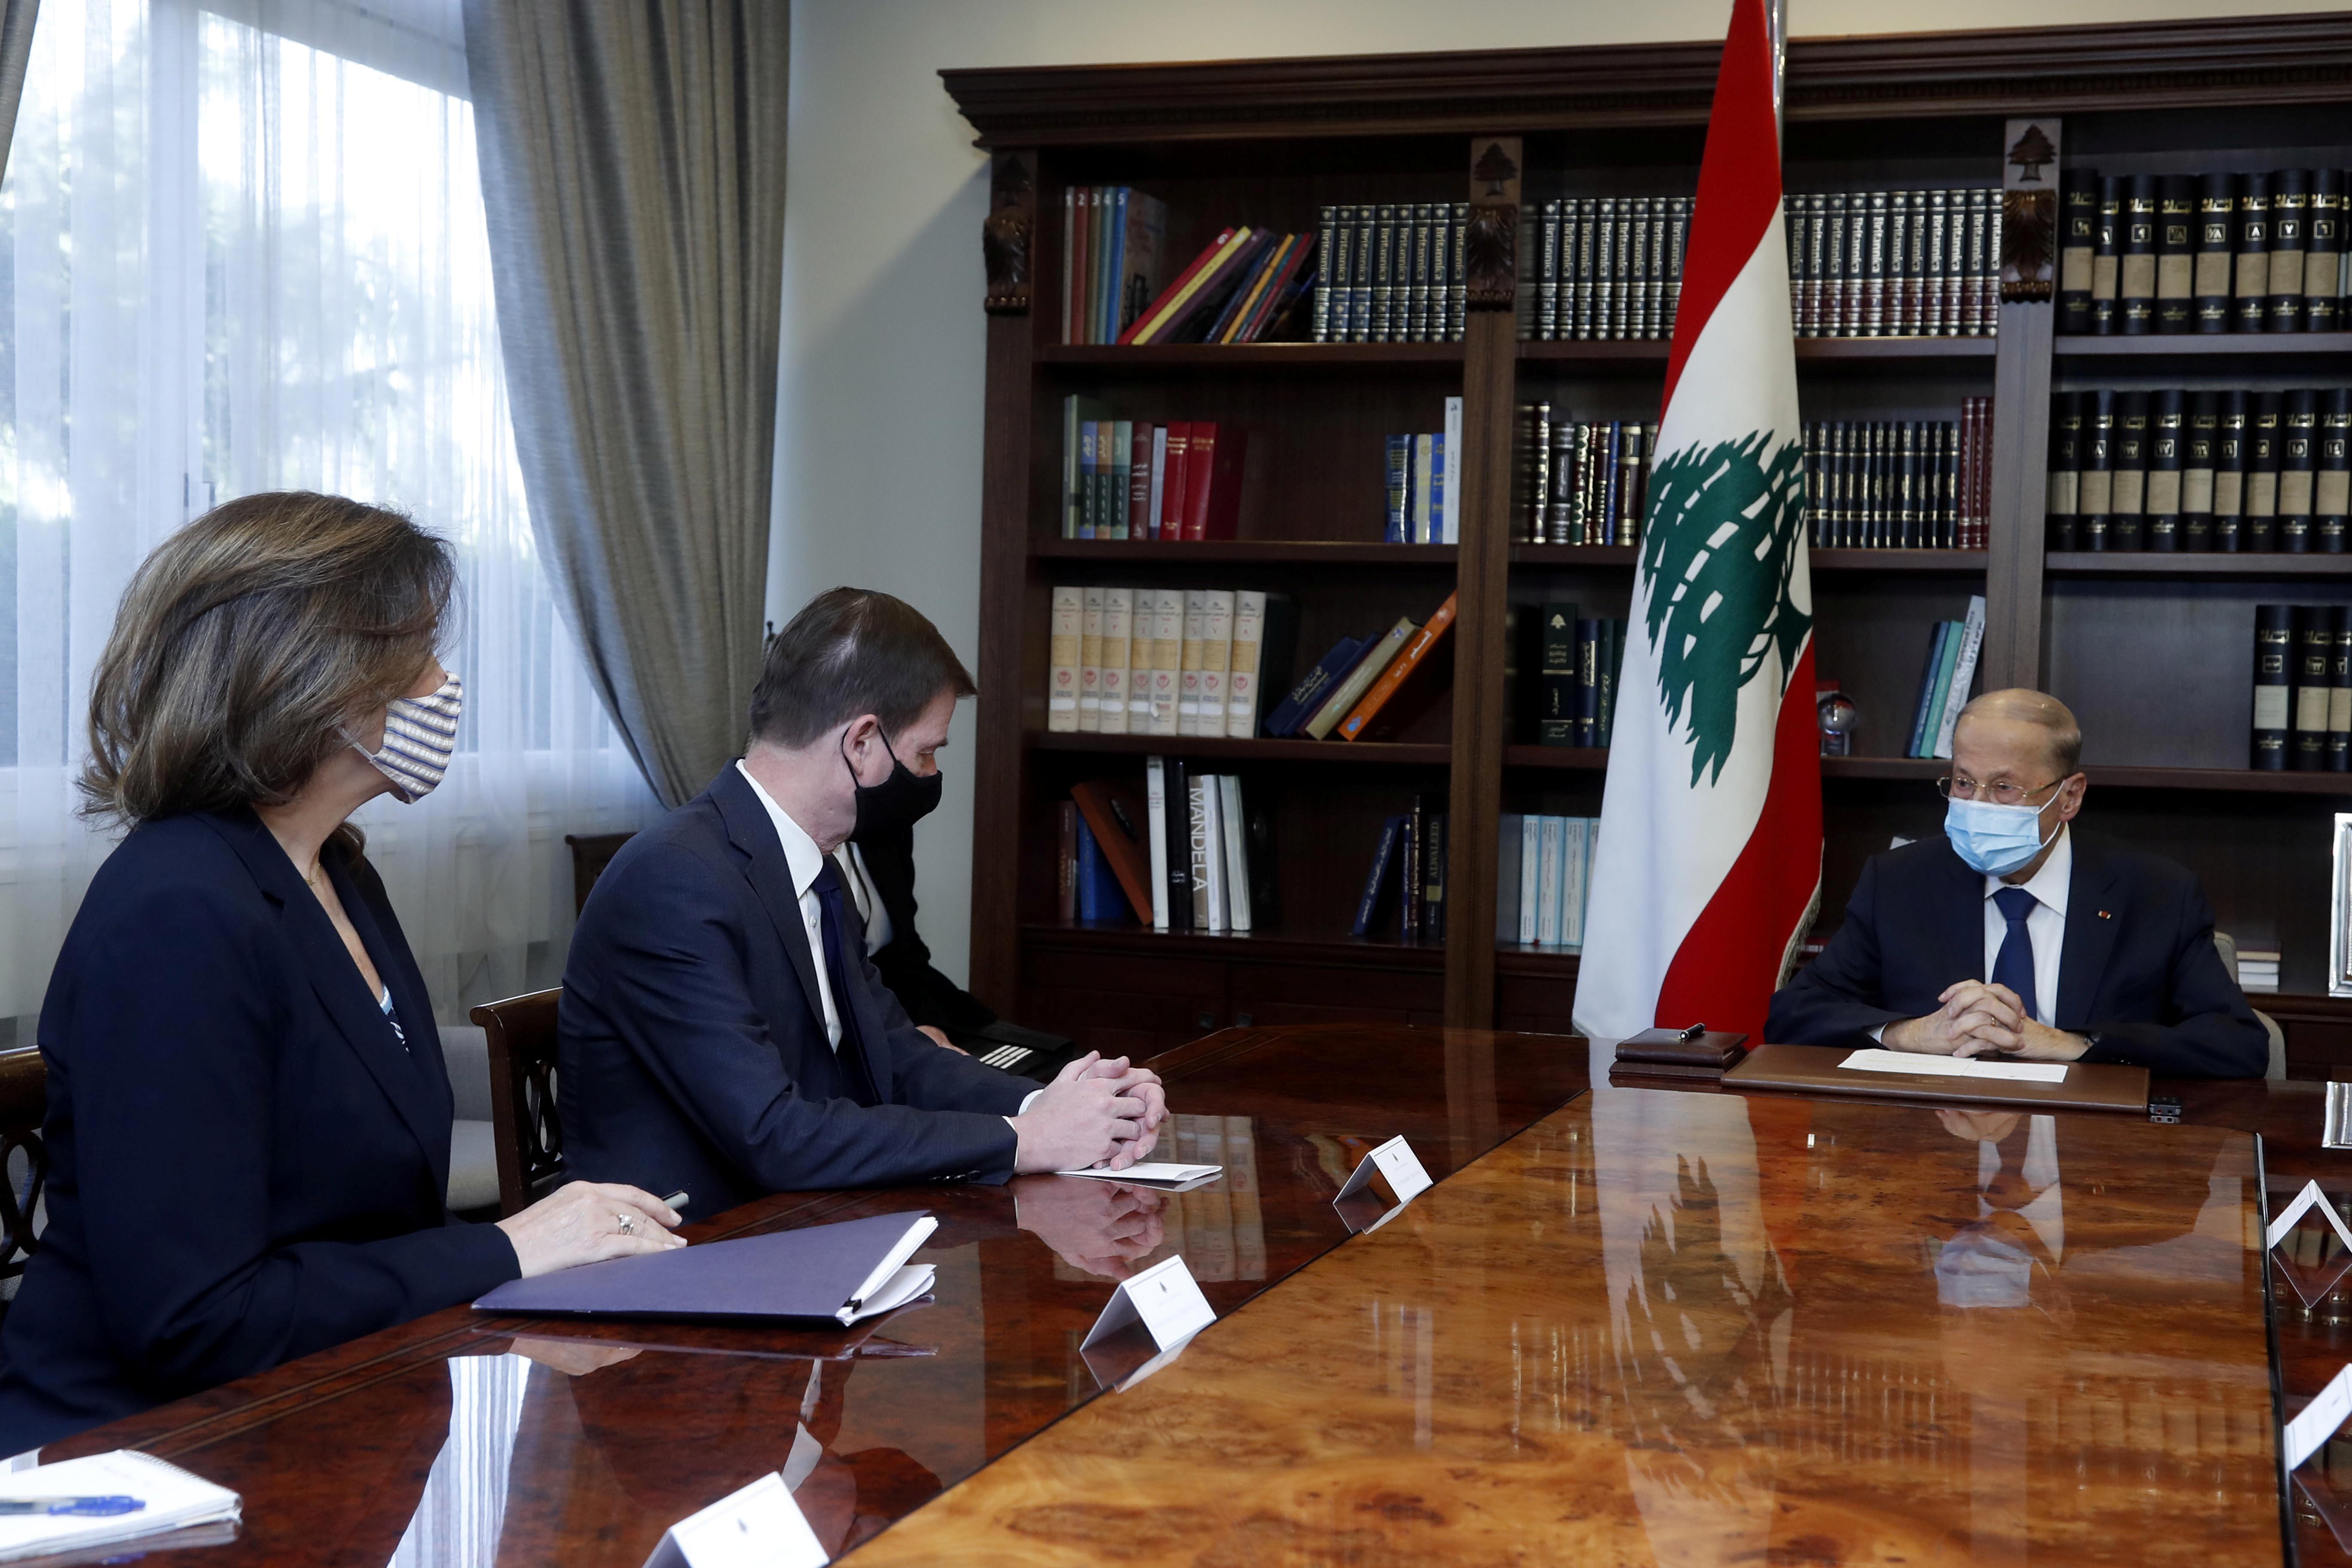 U.S. Under Secretary of State for Political Affairs David Hale meets with Lebanon's President Michel Aoun at the presidential palace in Baabda, Lebanon April 15, 2021. Dalati Nohra/Handout via REUTERS